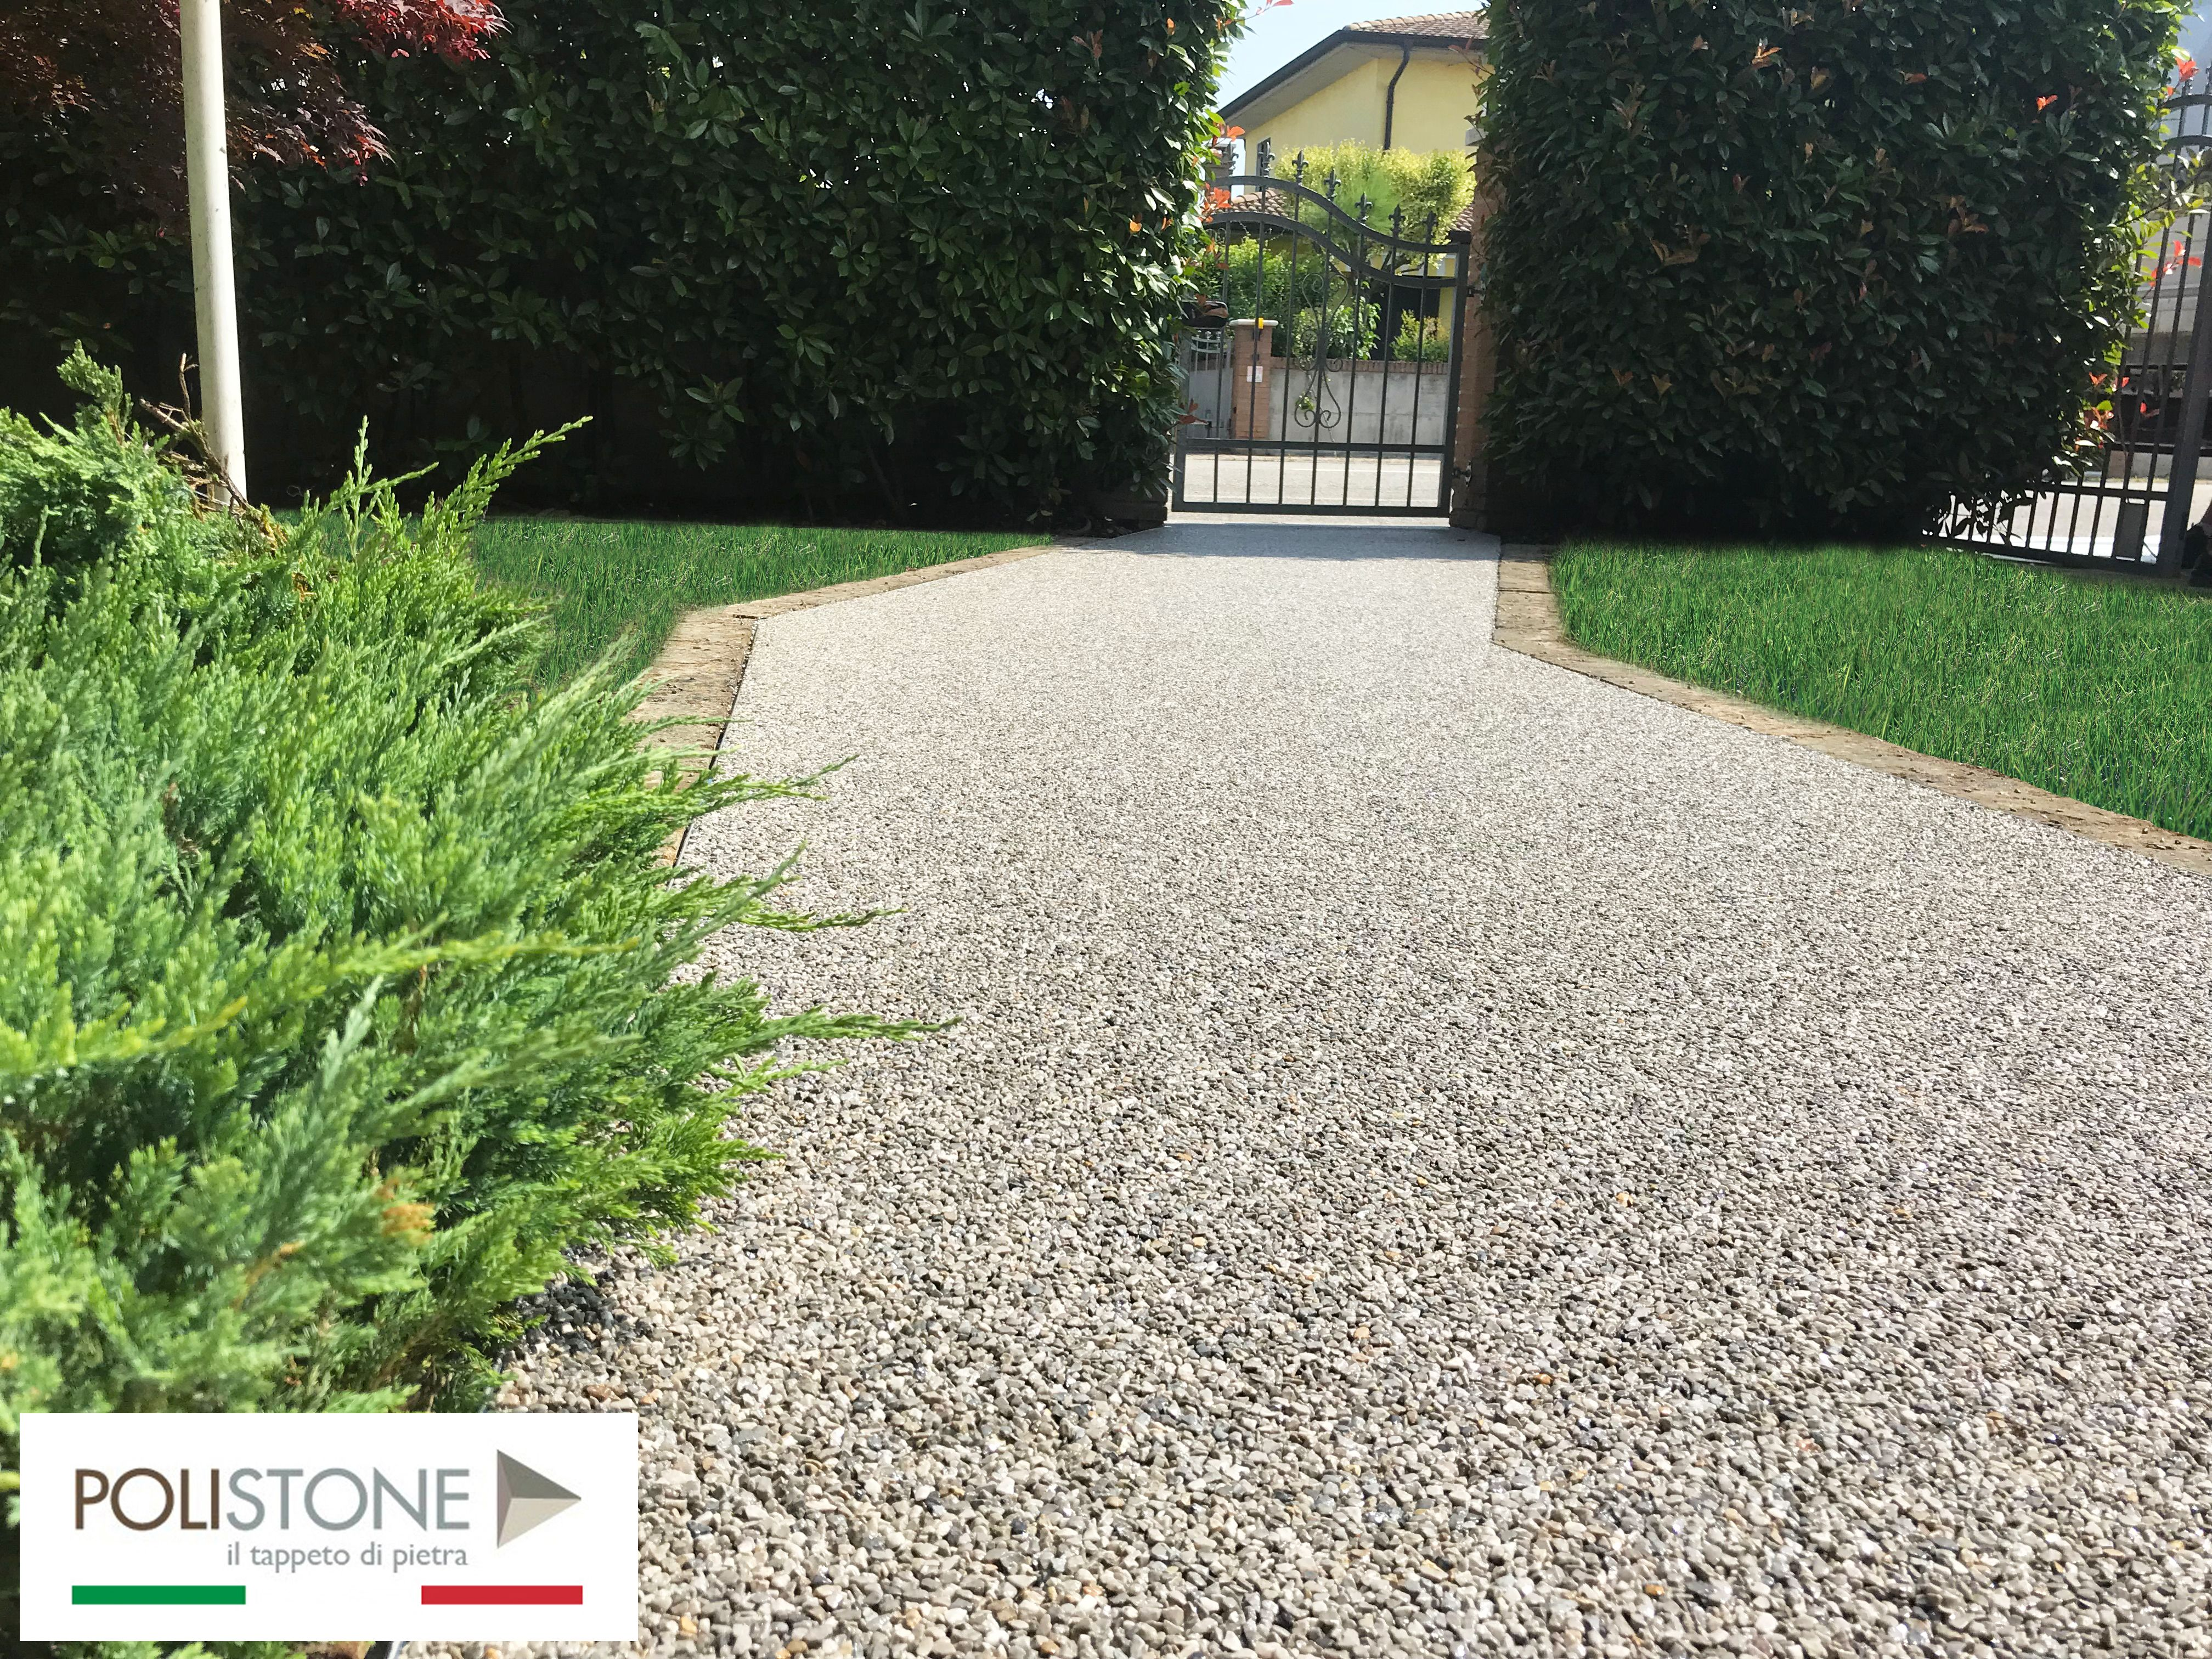 Pavimentazione Giardino In Pietra granuresina è una pavimentazione in pietra naturale drenante